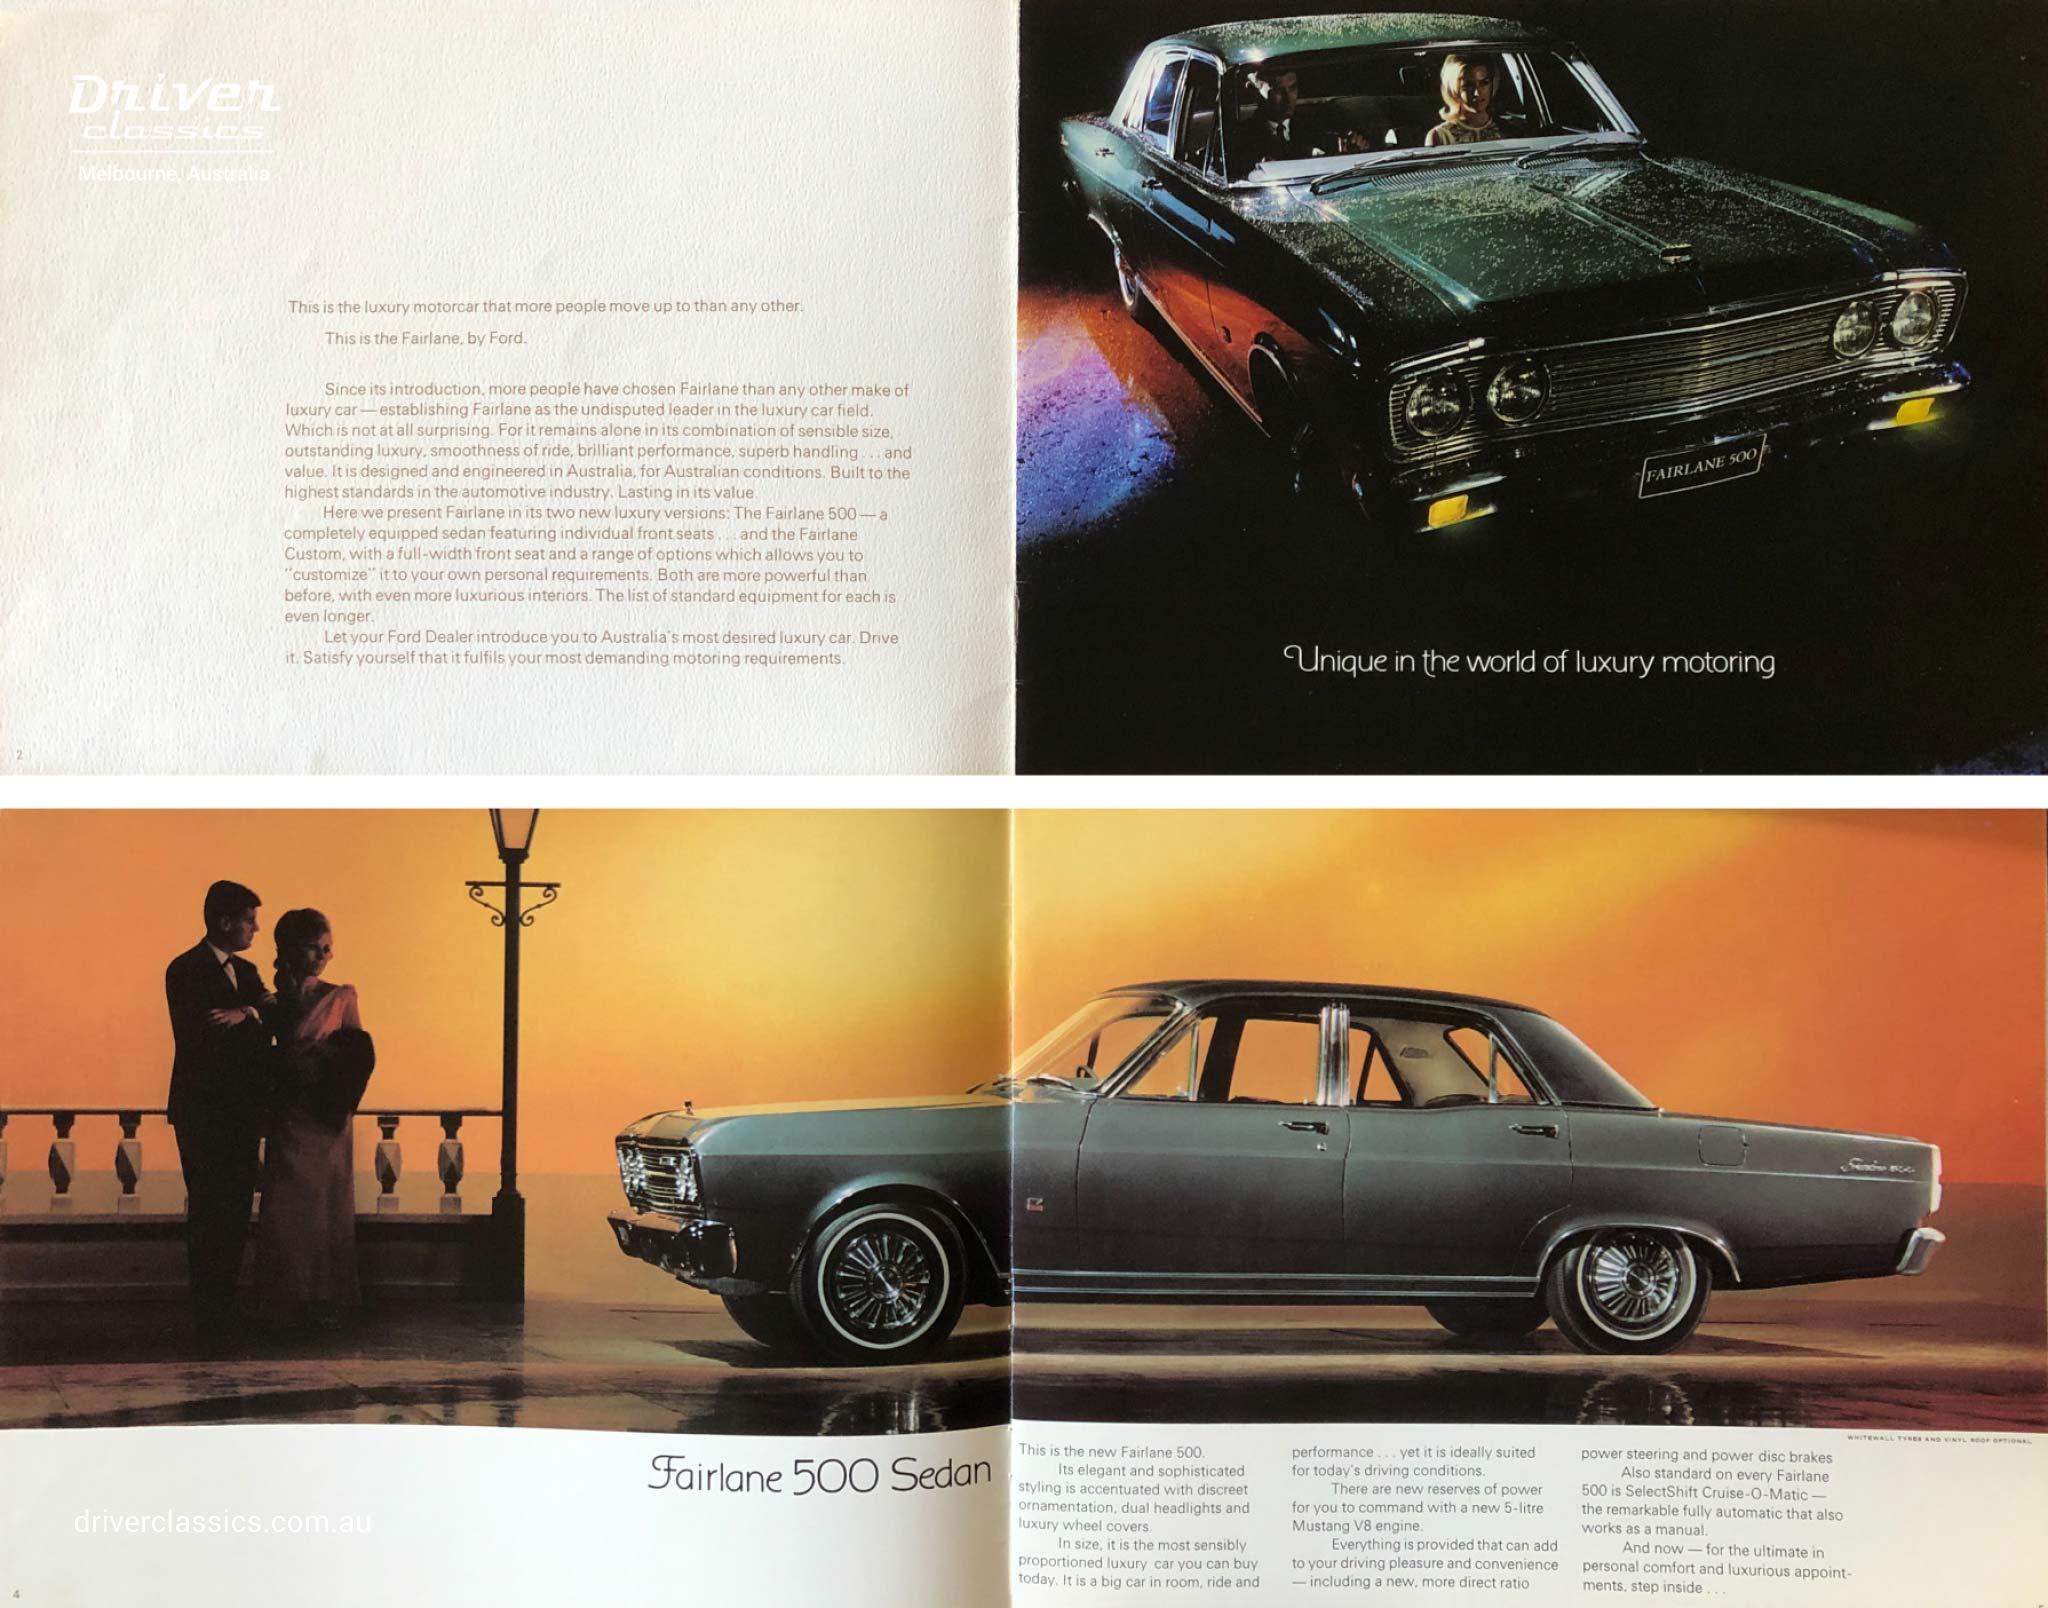 1968 Ford Fairlane 500 brochure, Australian Fairlane 500